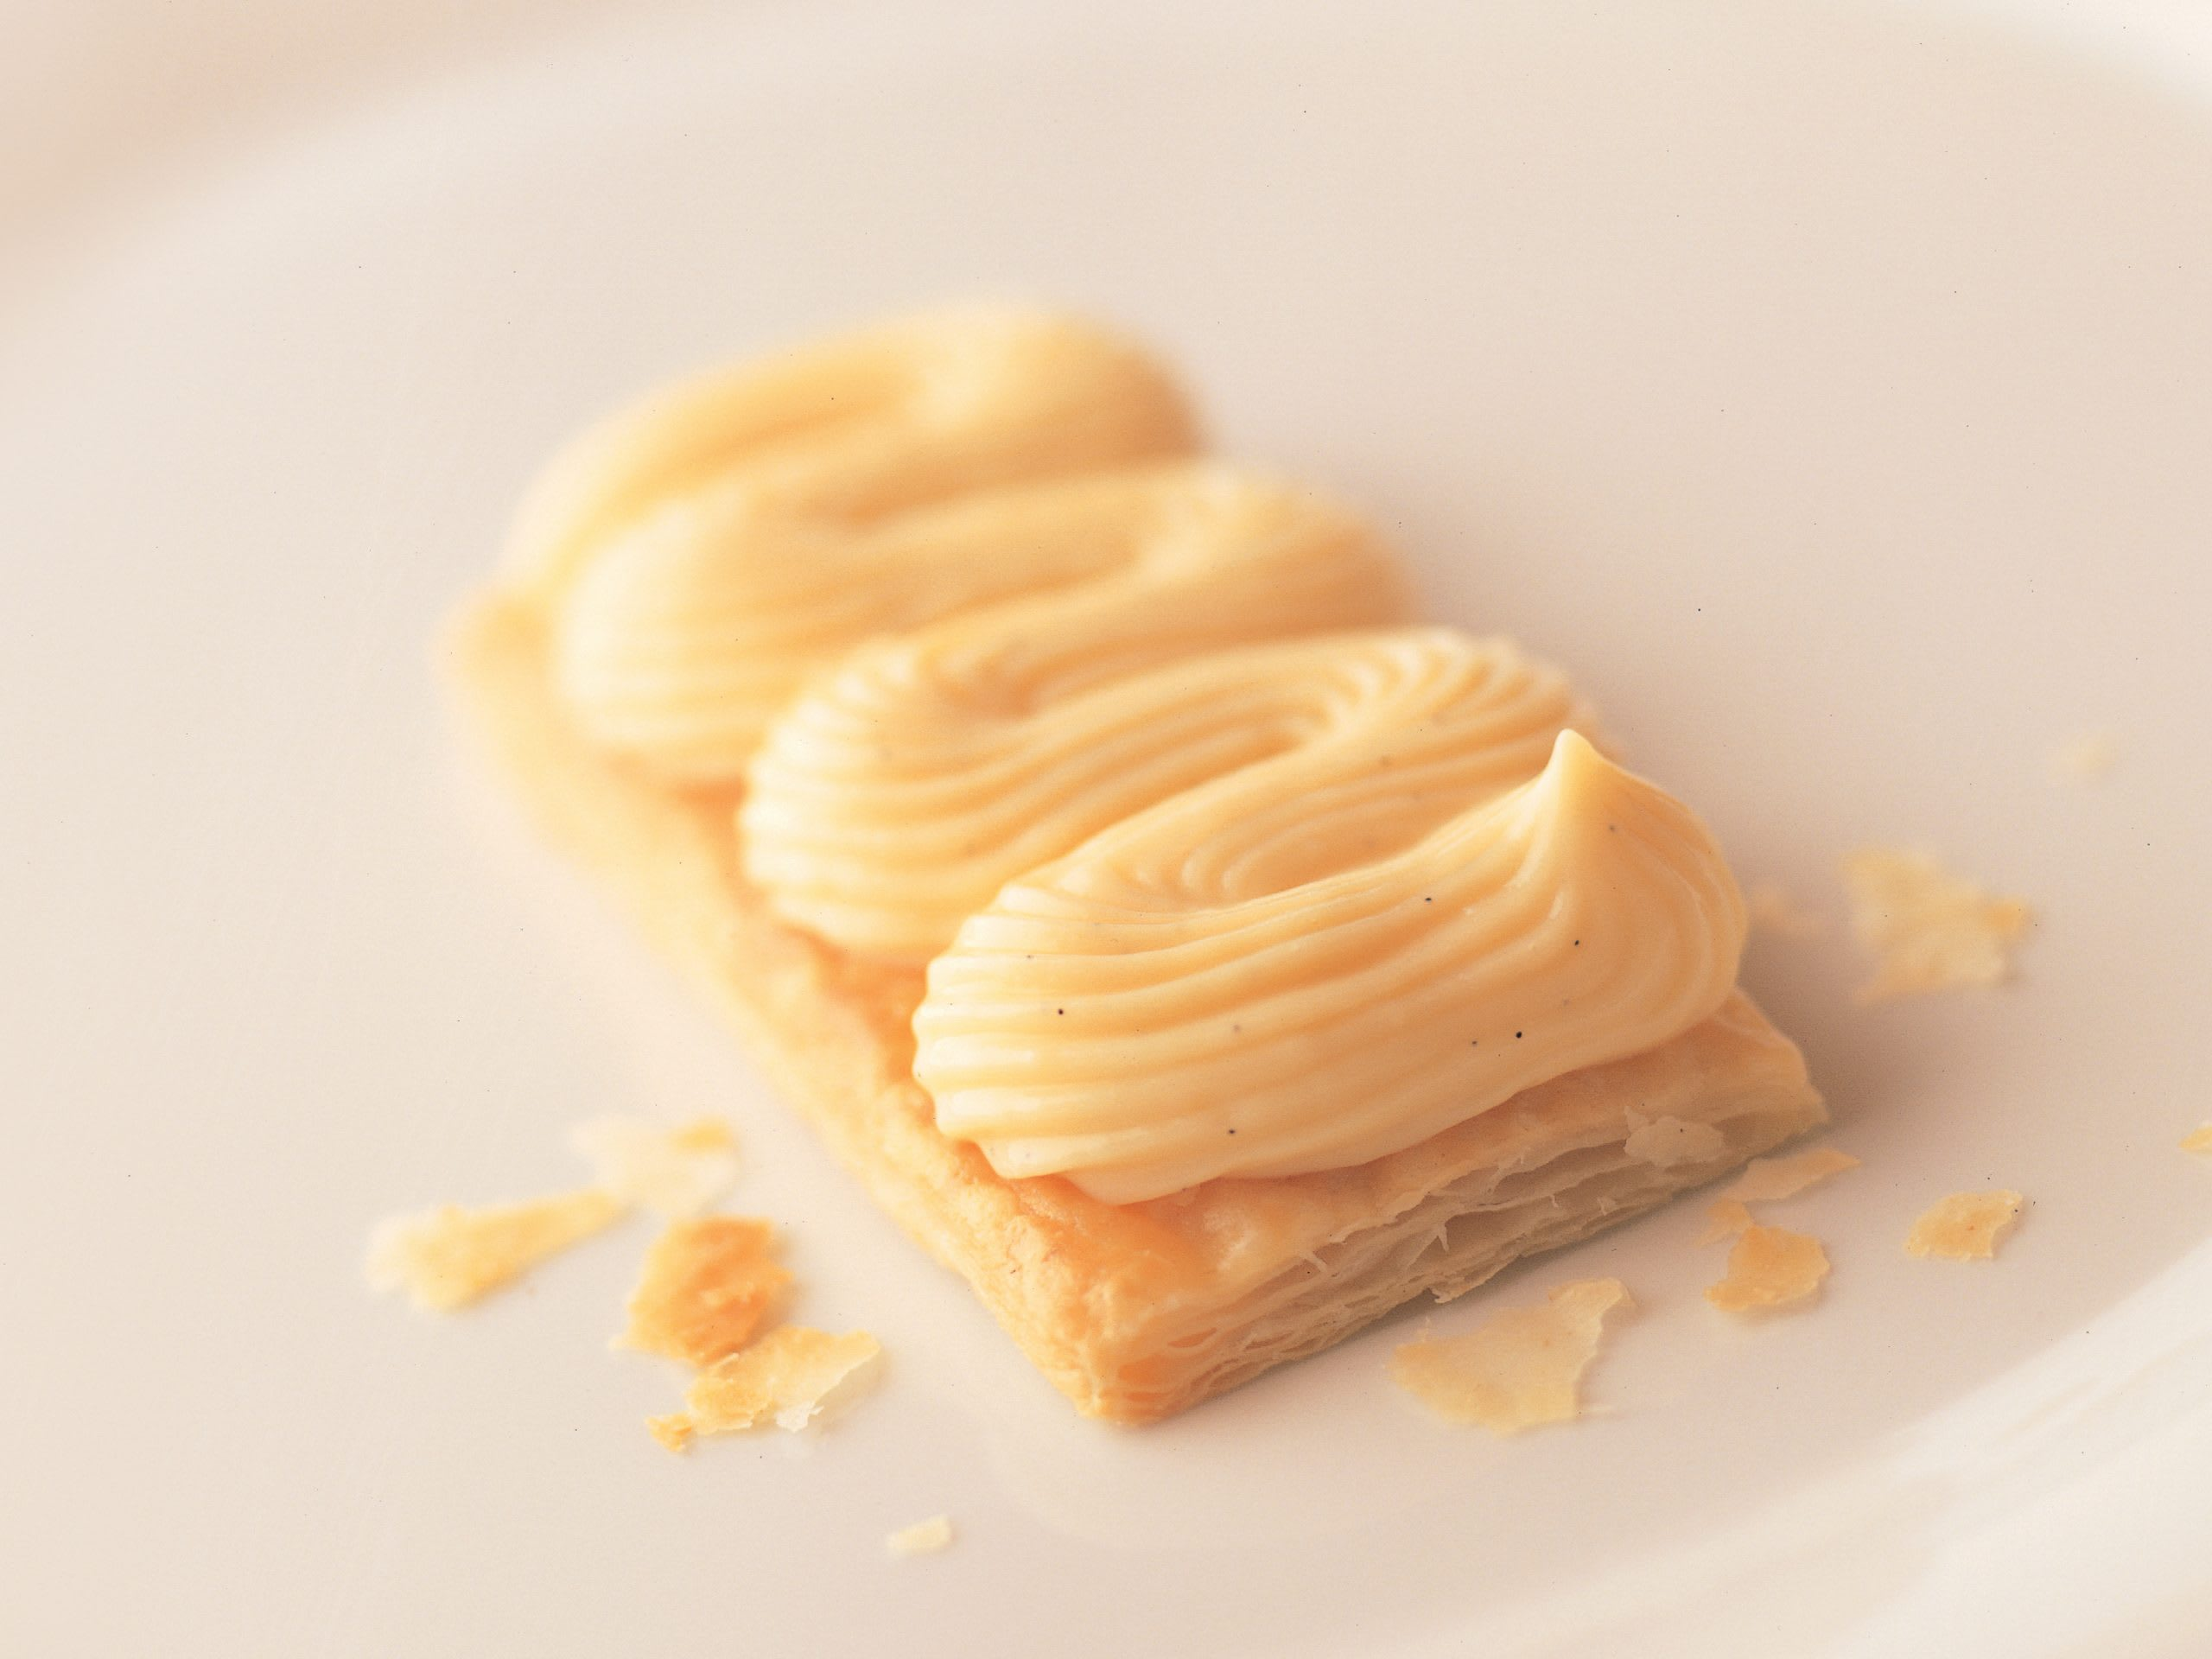 Konditorcrème (Crème Pâtissière)